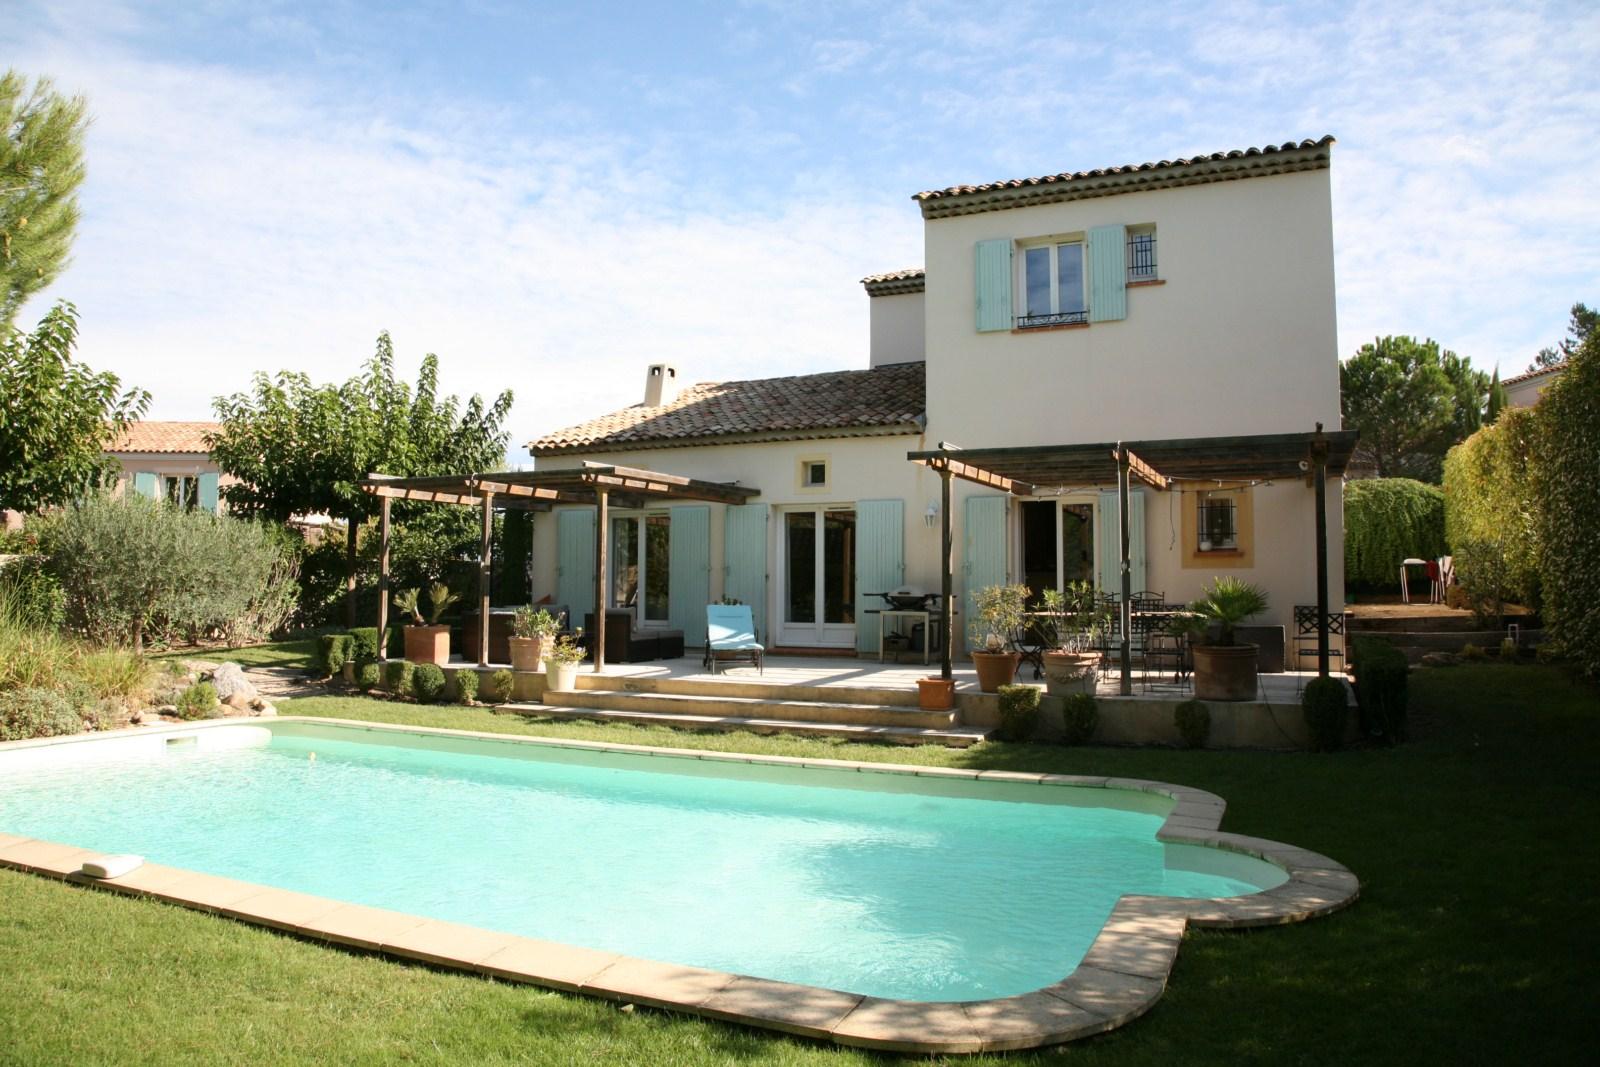 Un mas 4 chambres avec piscine et garage john cheetham for Maison standard